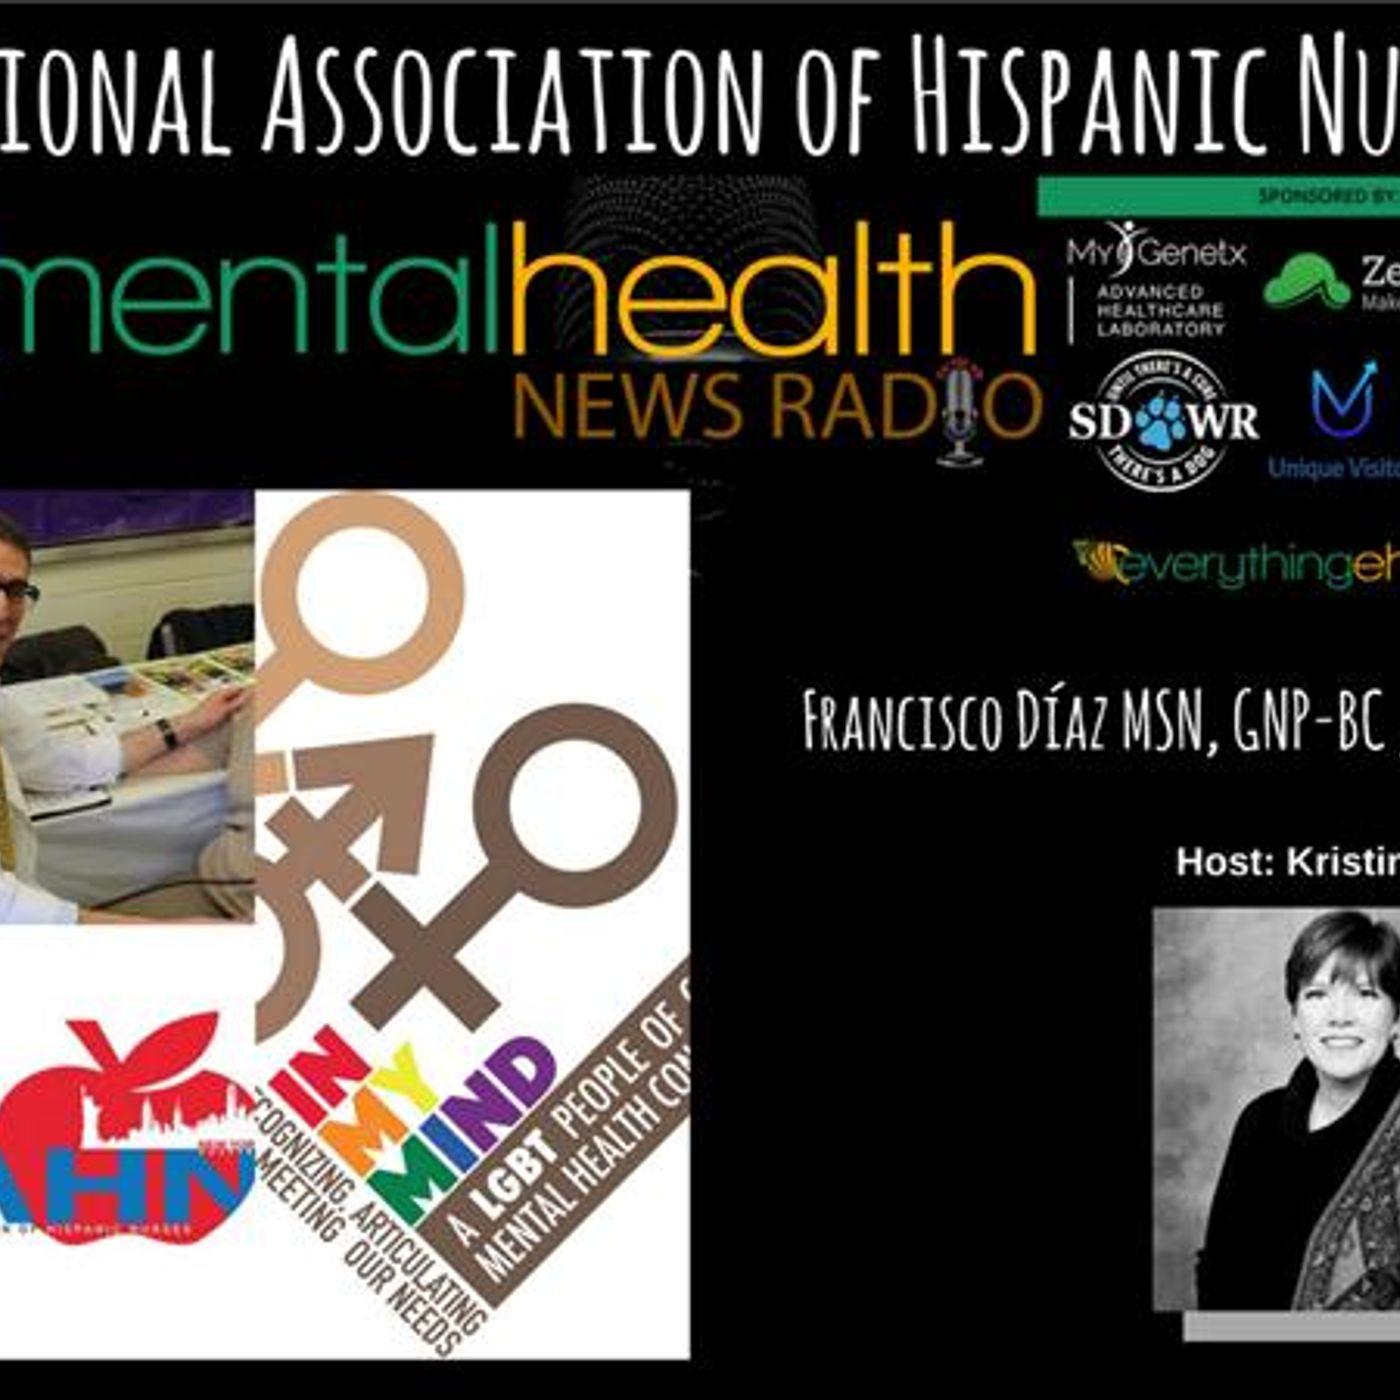 Mental Health News Radio - DBGM In My Mind Conference: National Association of Hispanic Nurses